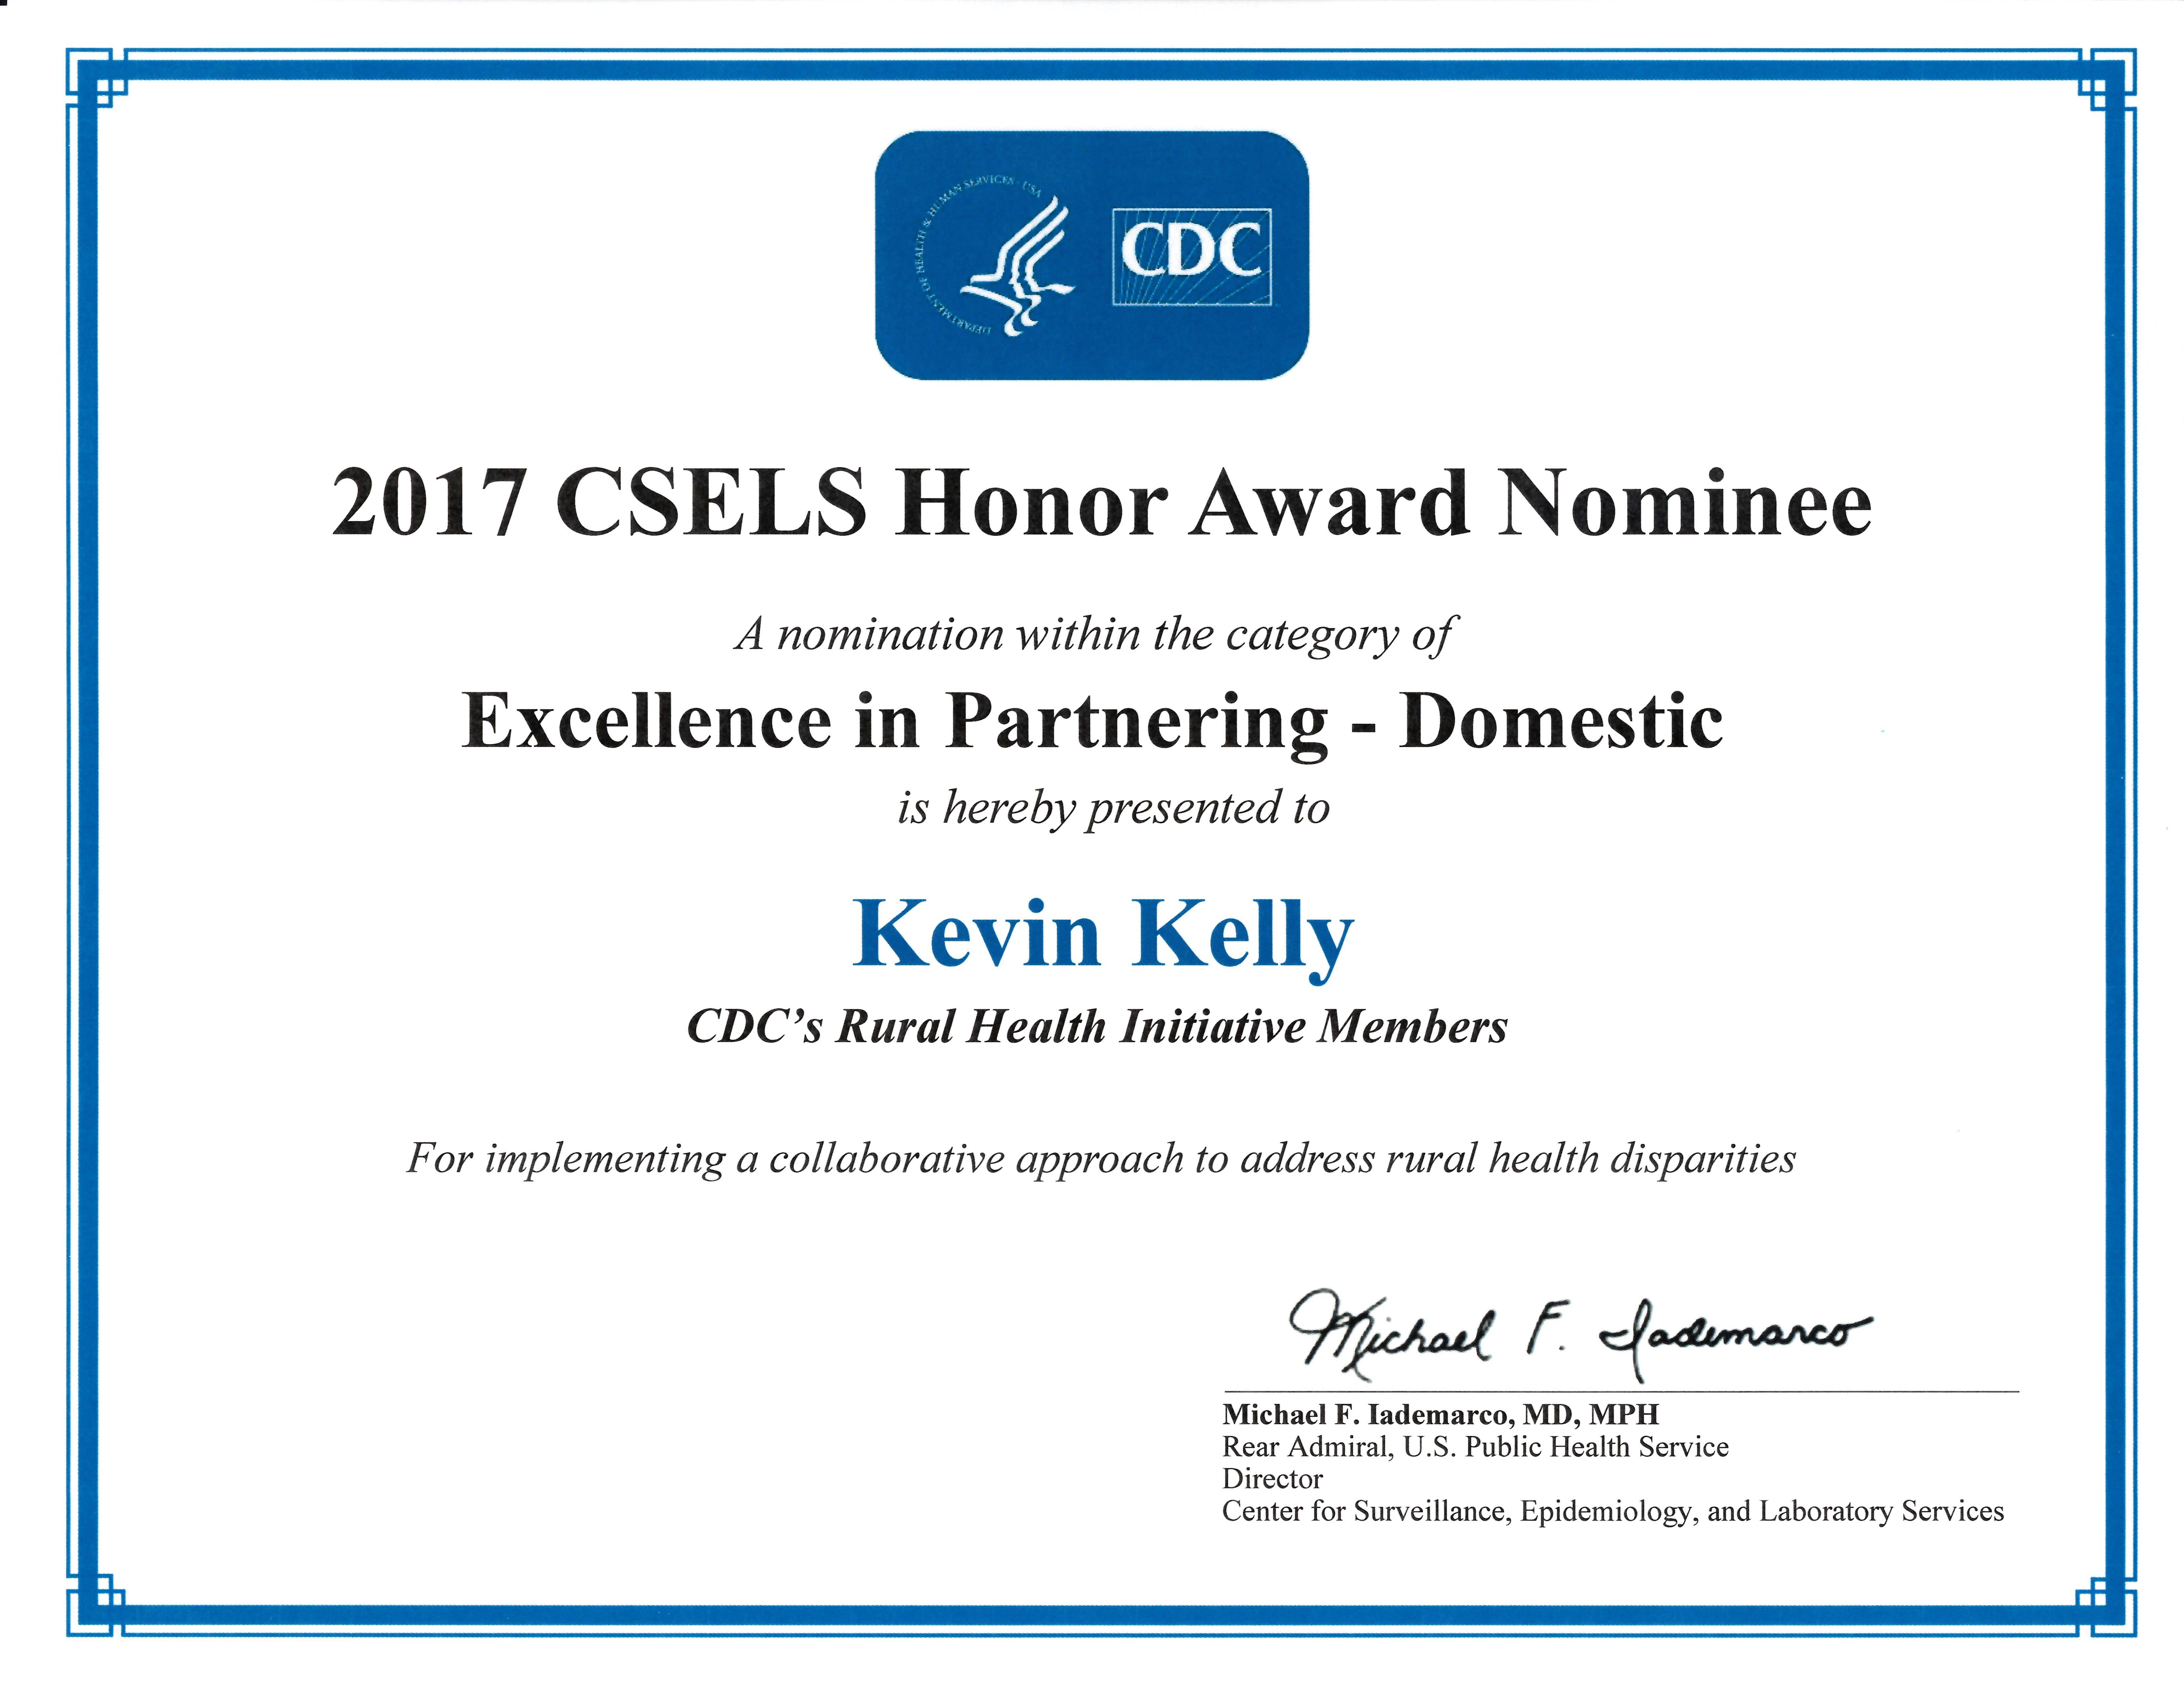 2017 CSELS Honor Award Nominee